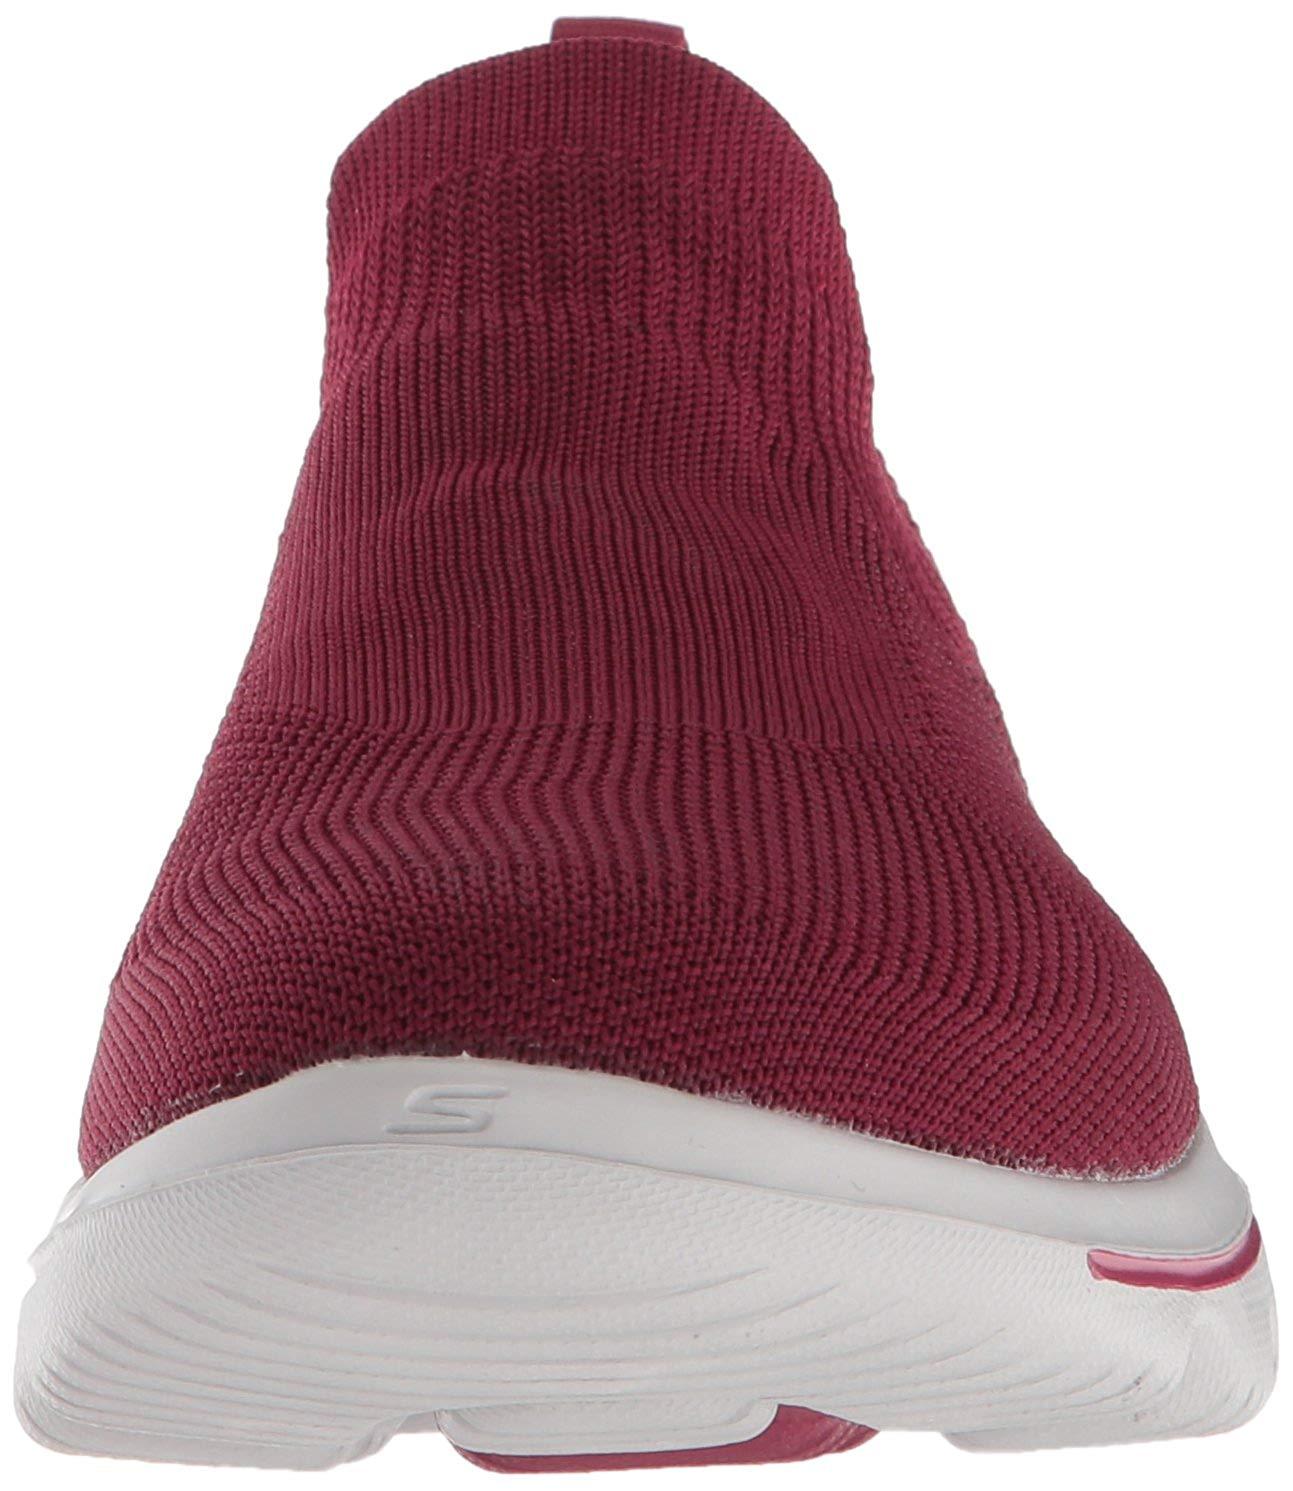 809335b1b32b Skechers Women s Go Walk Evolution Ultra Sneaker